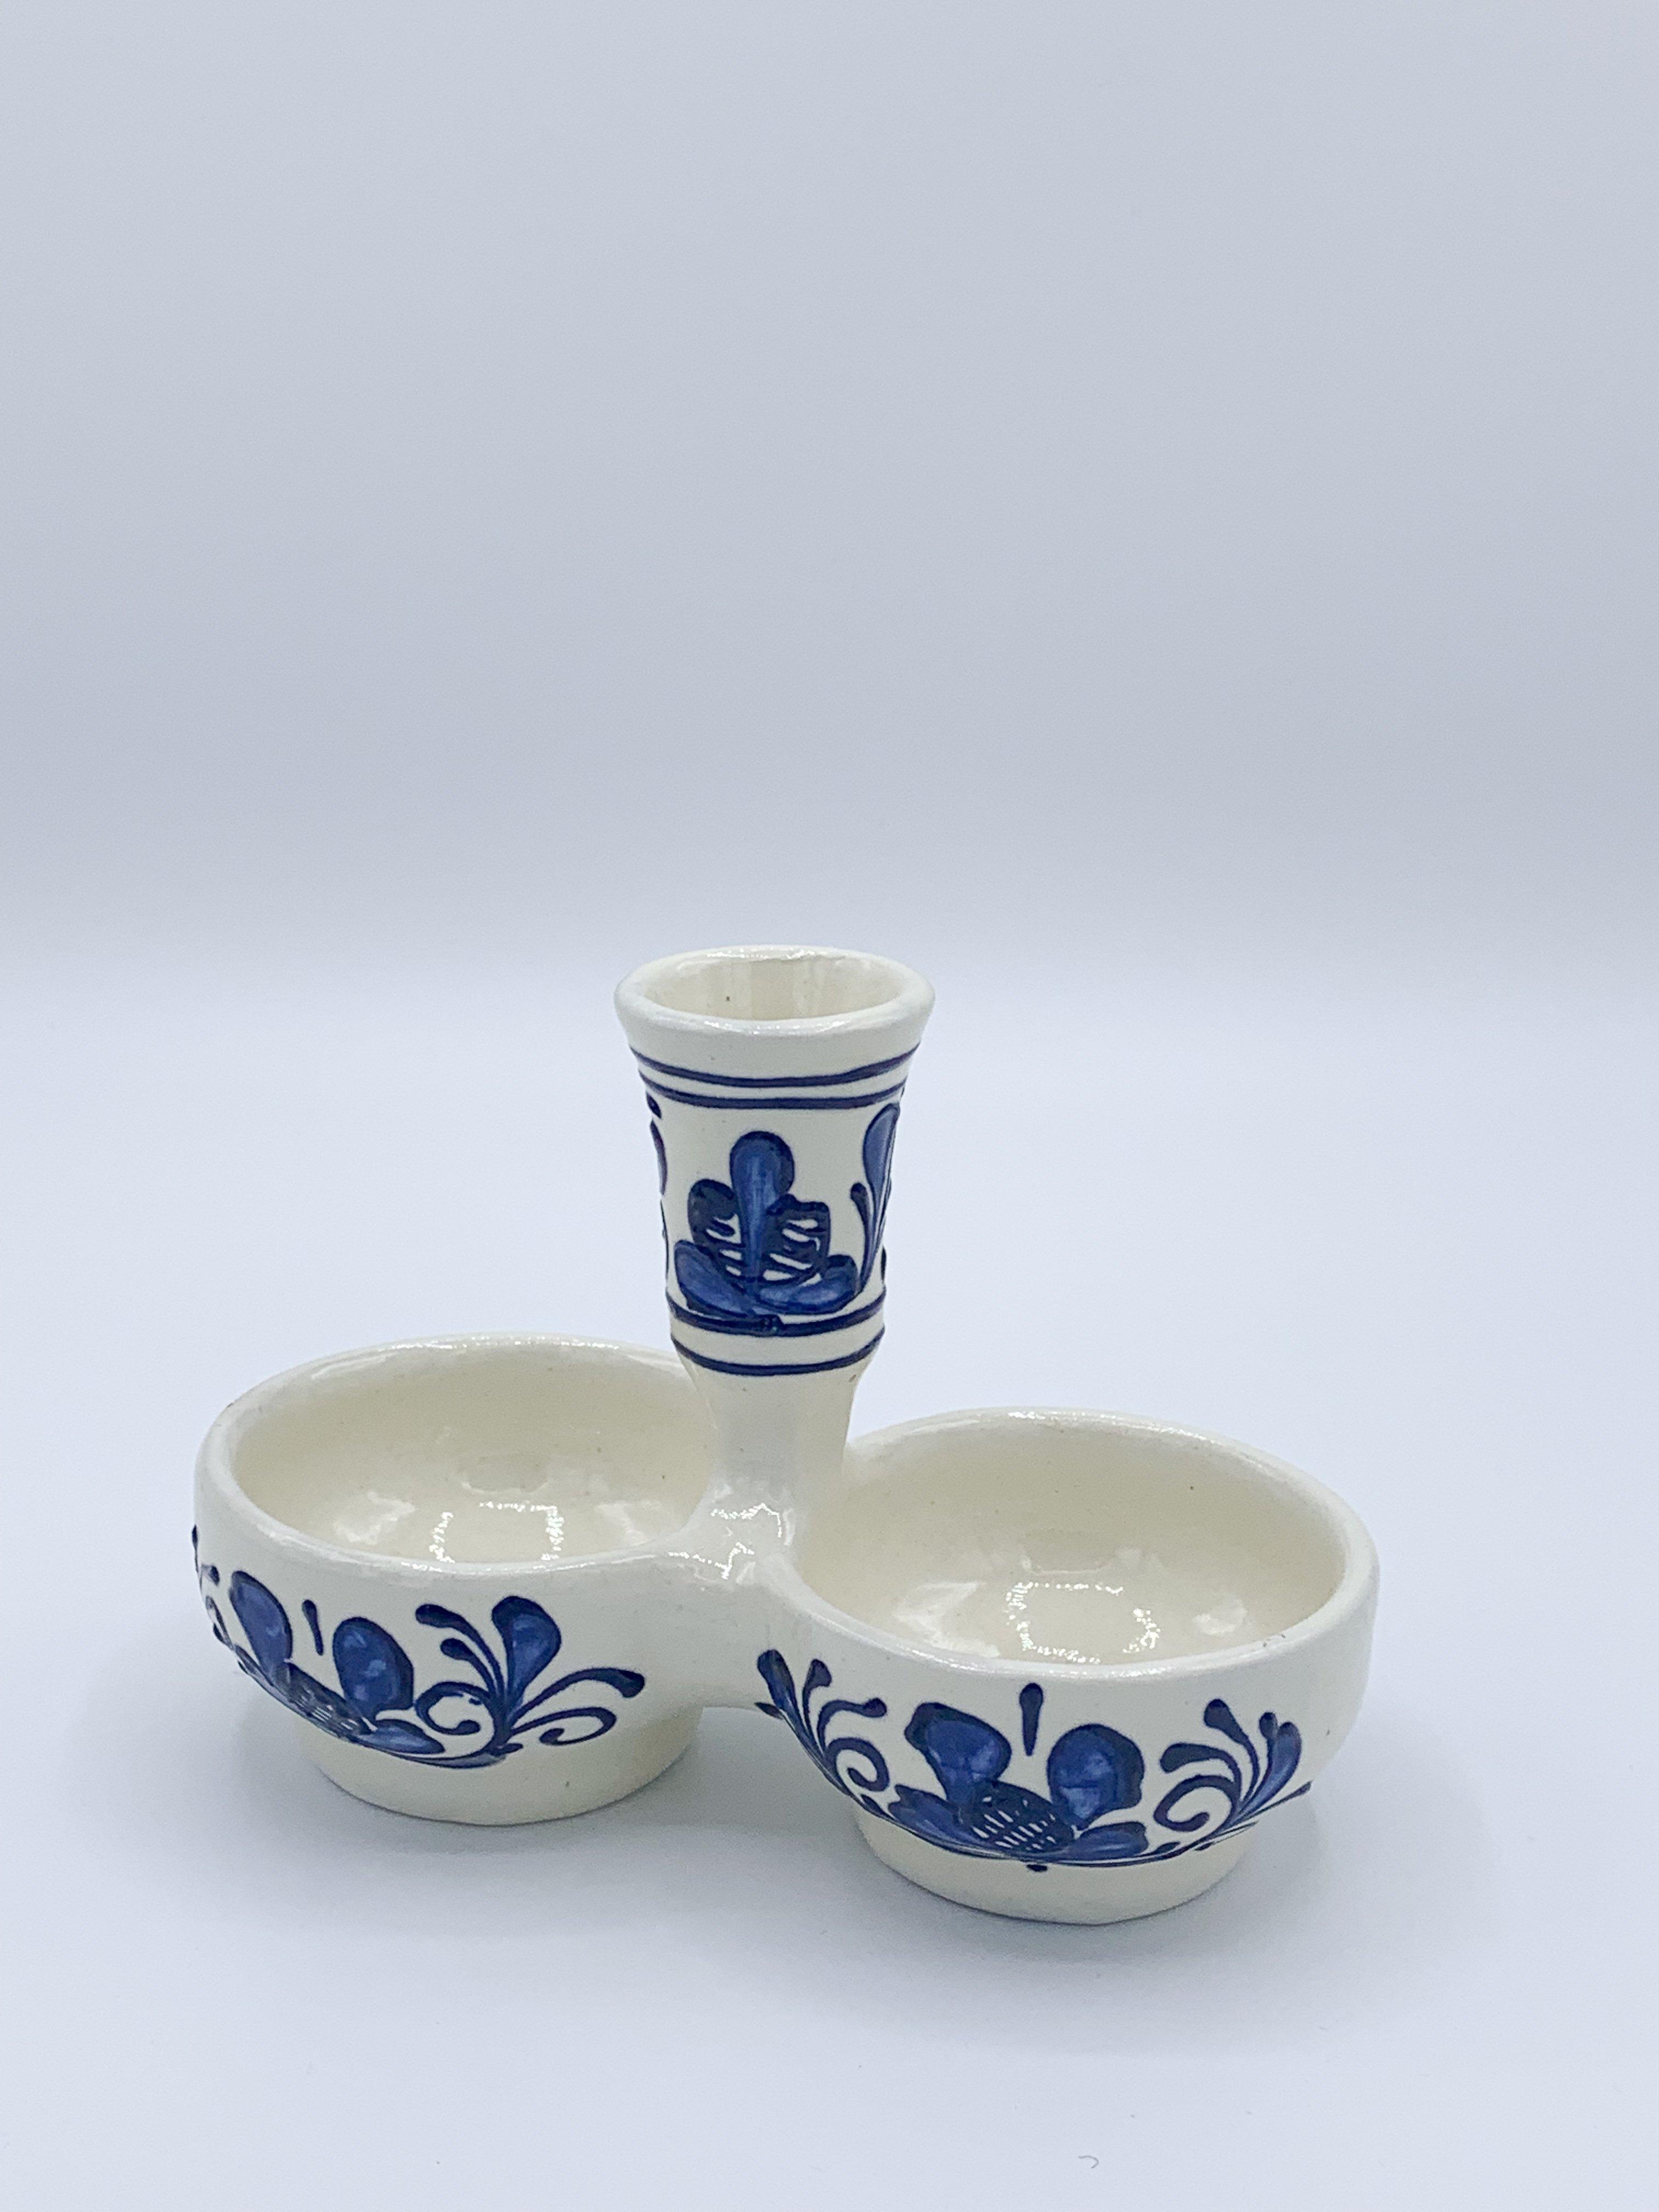 Solnita din ceramica de corund 2